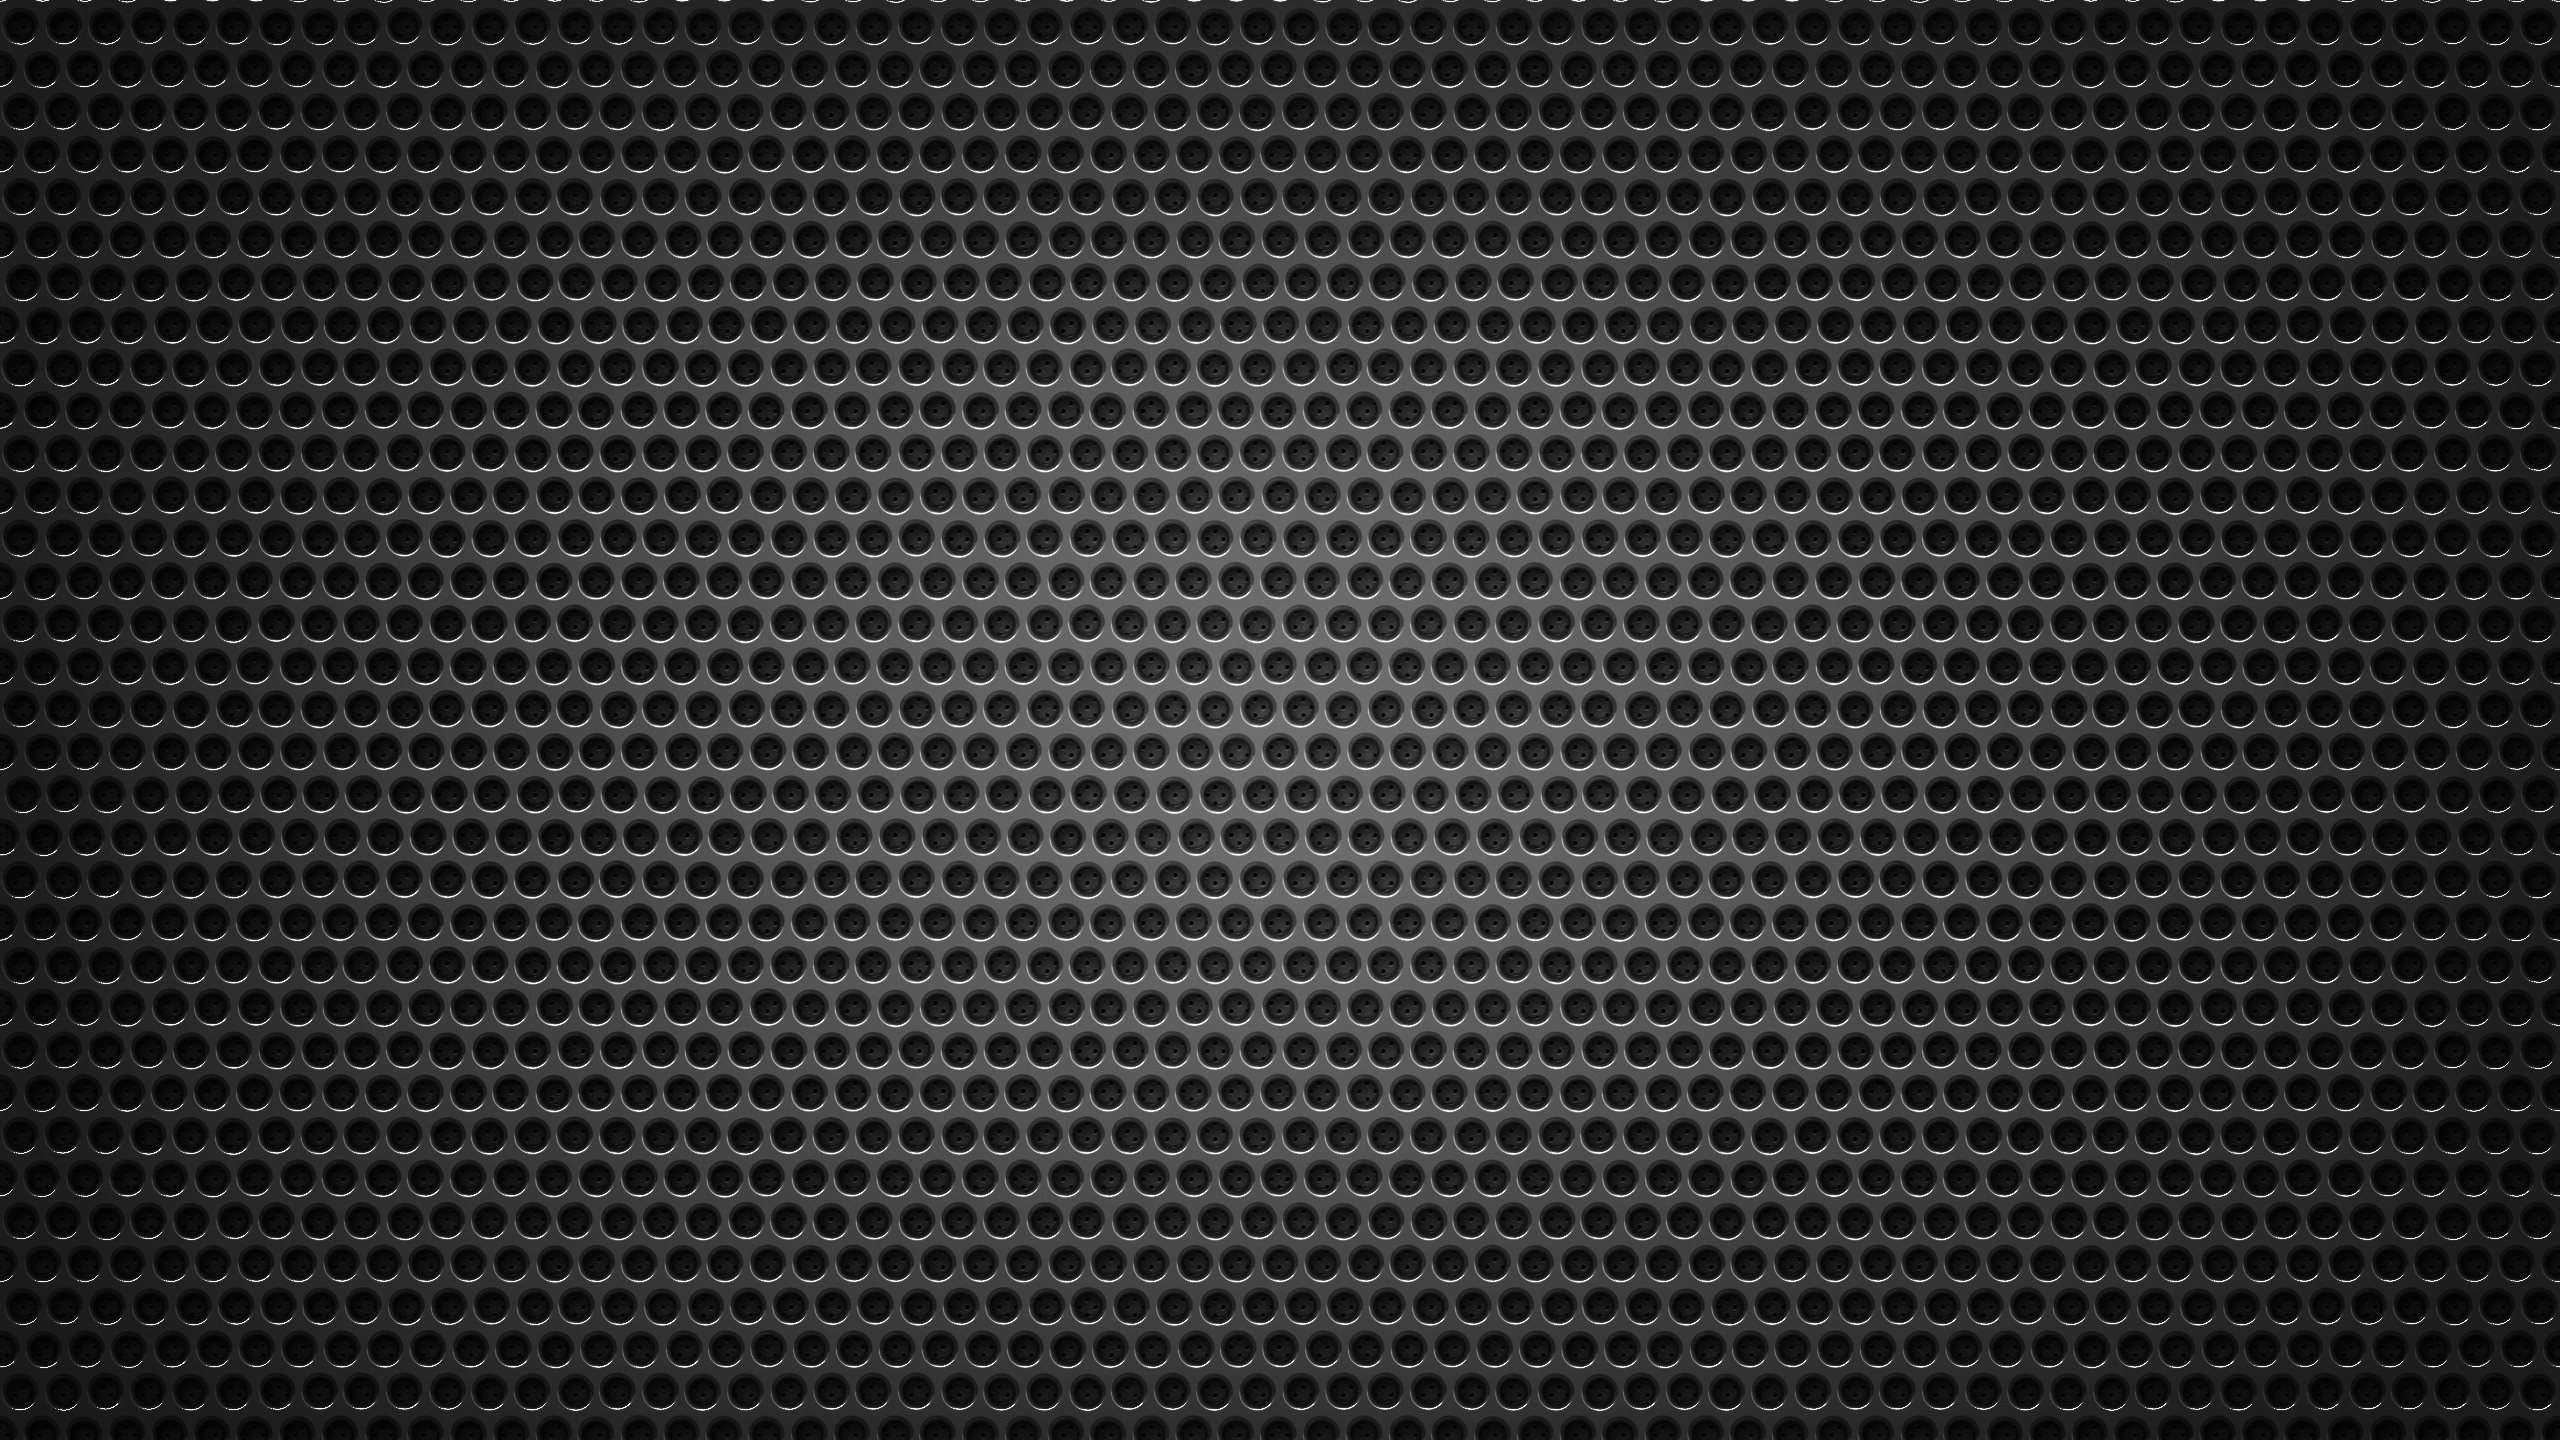 how to make google chrome background black